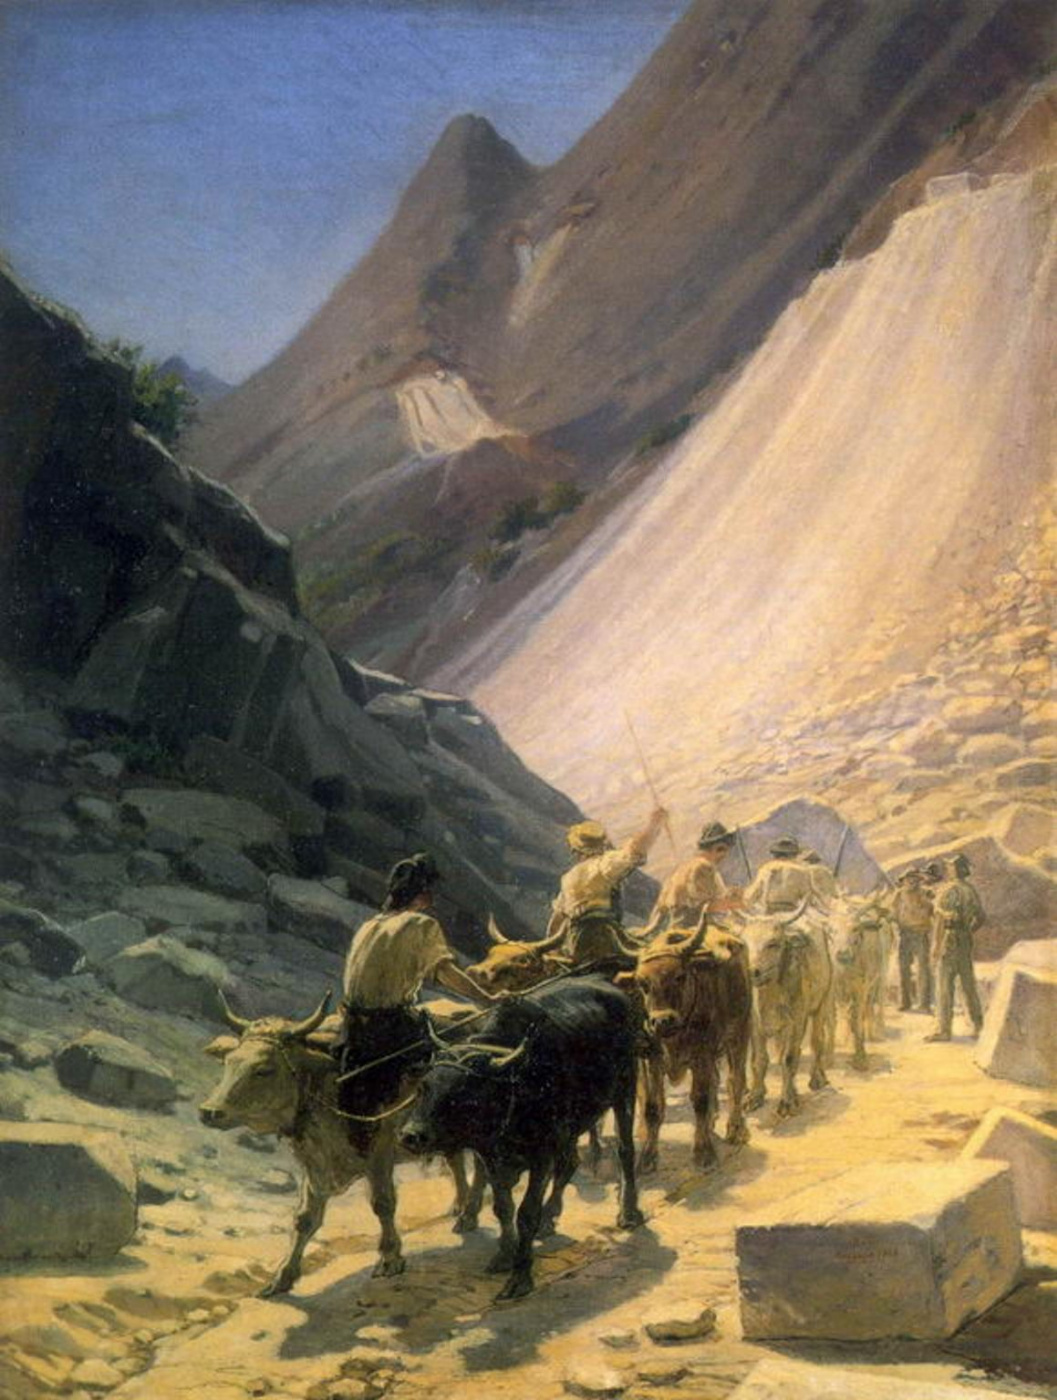 Nikolai Nikolaevich Ge. Transportation of marble at Carrara